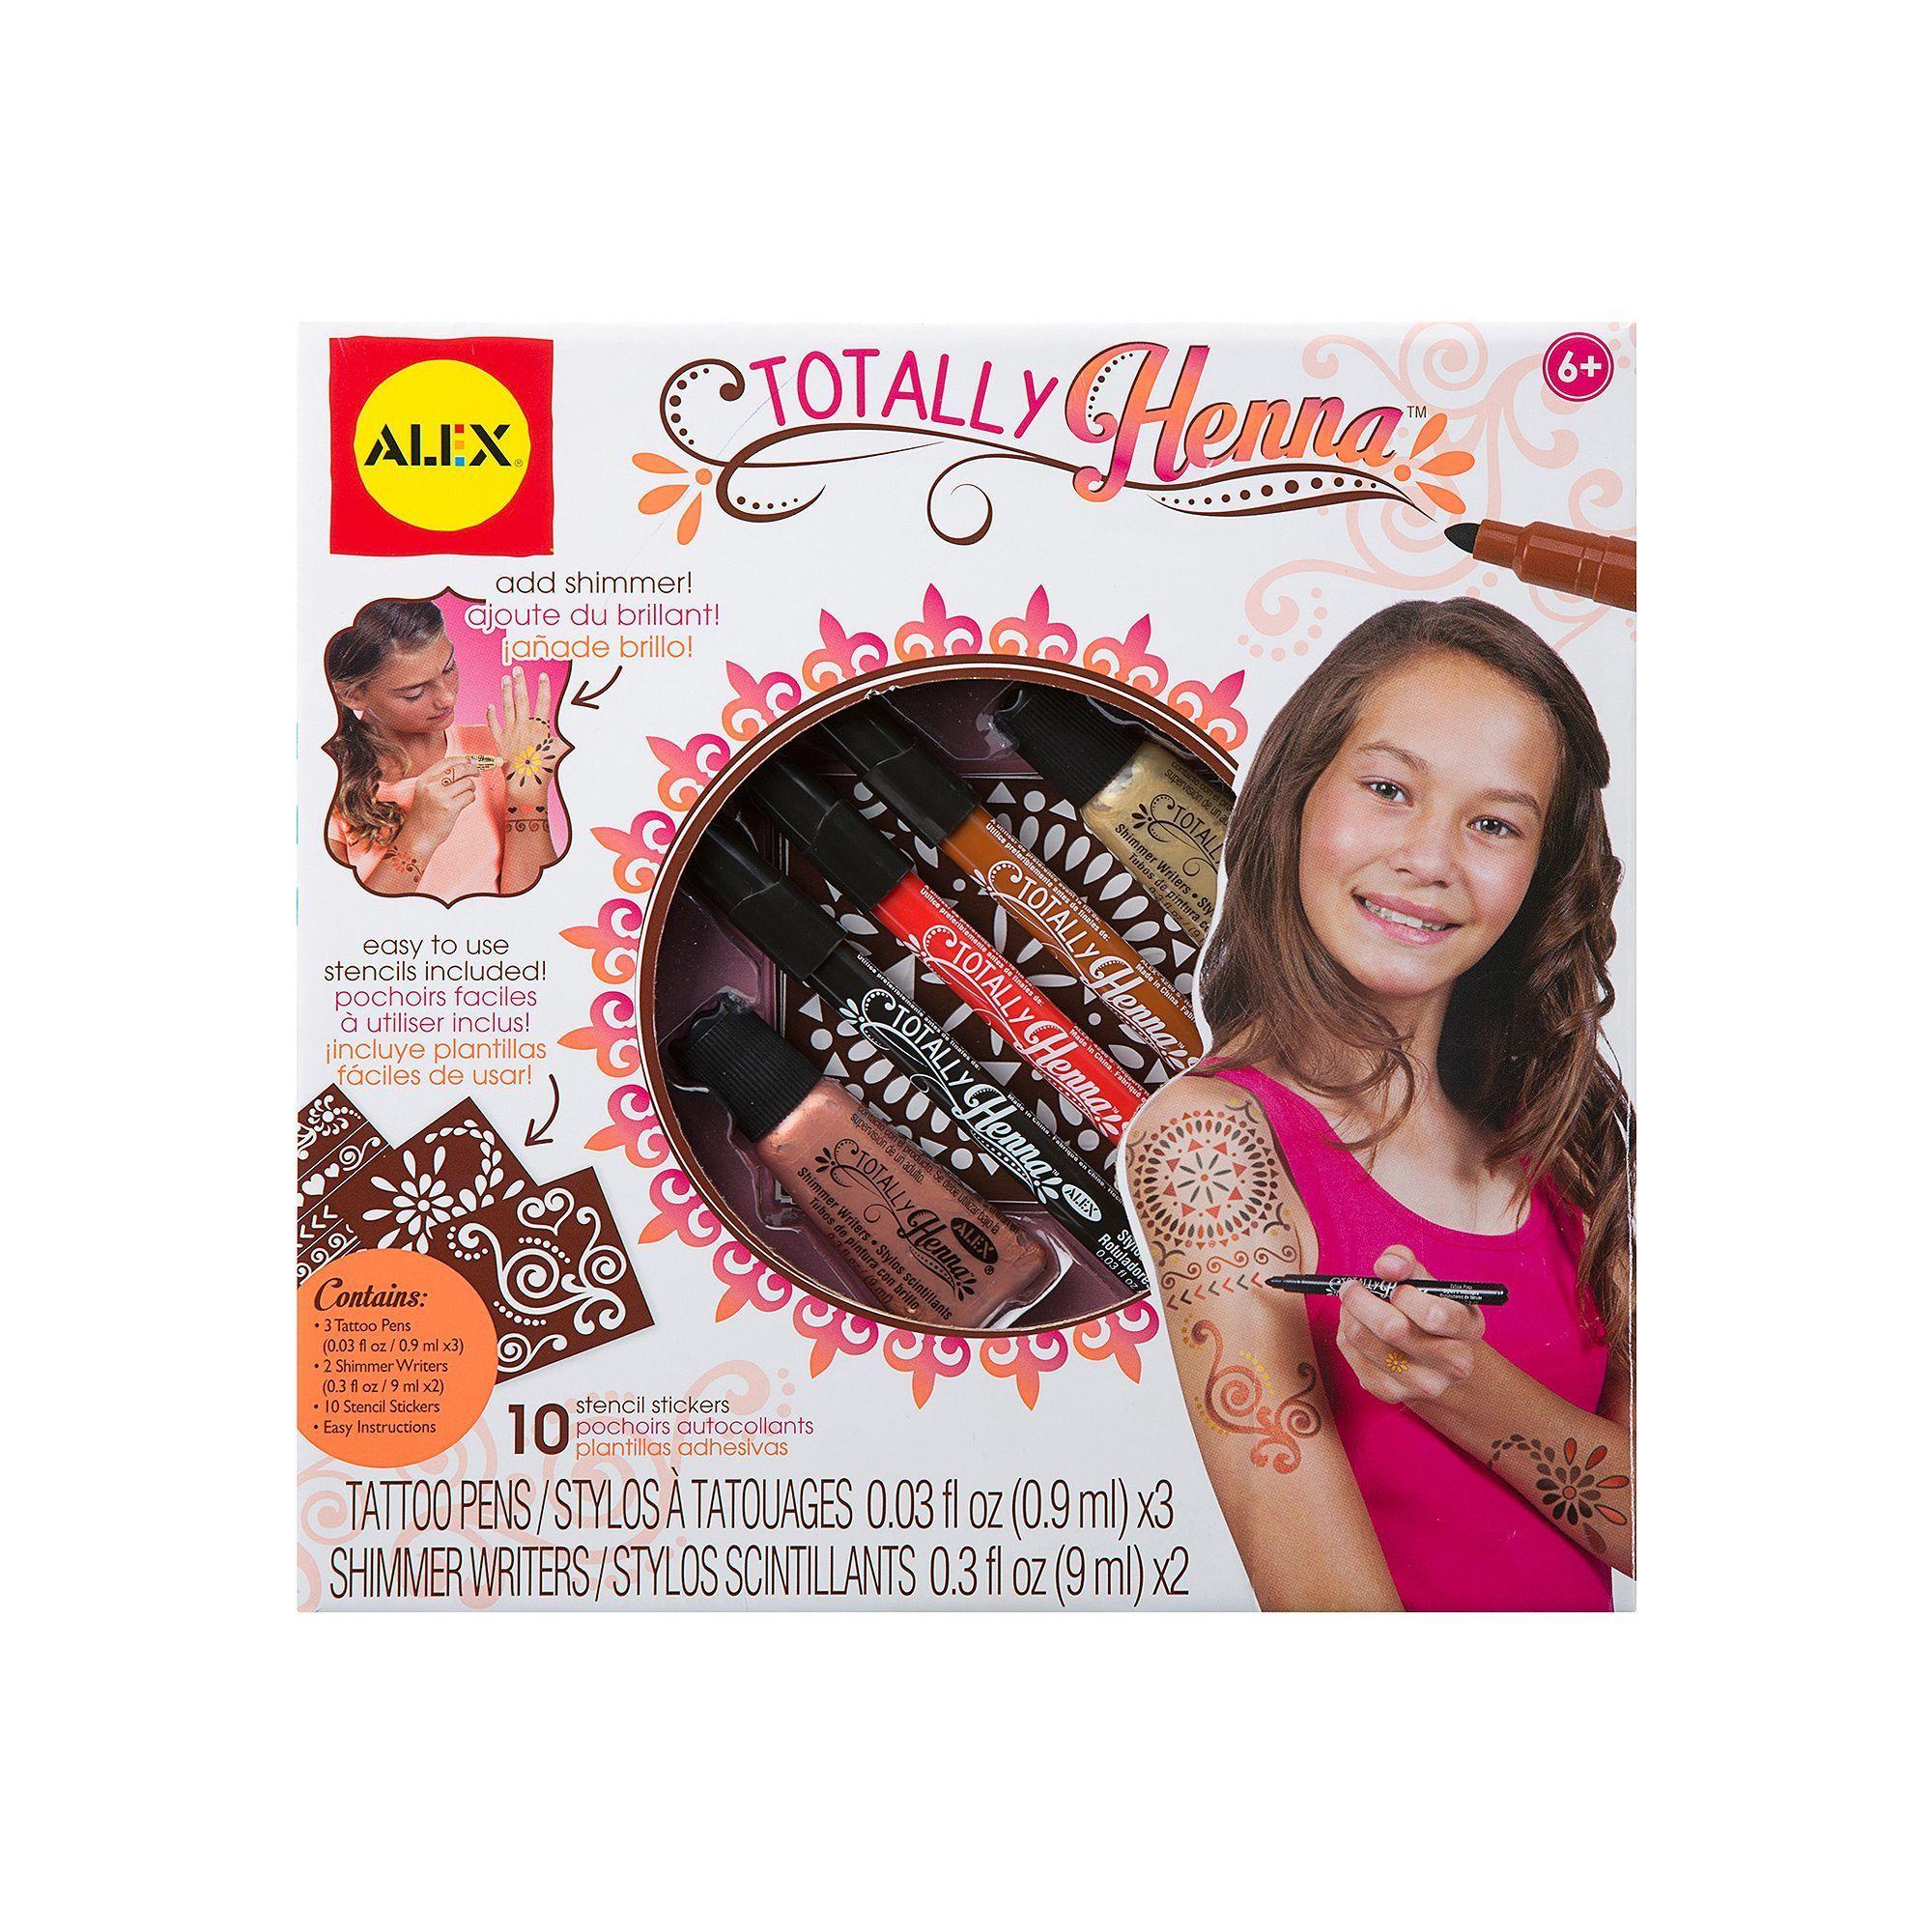 Henna Tattoo Kits For Kids: Henna Kit, Henna Tattoo Kit, Tattoos